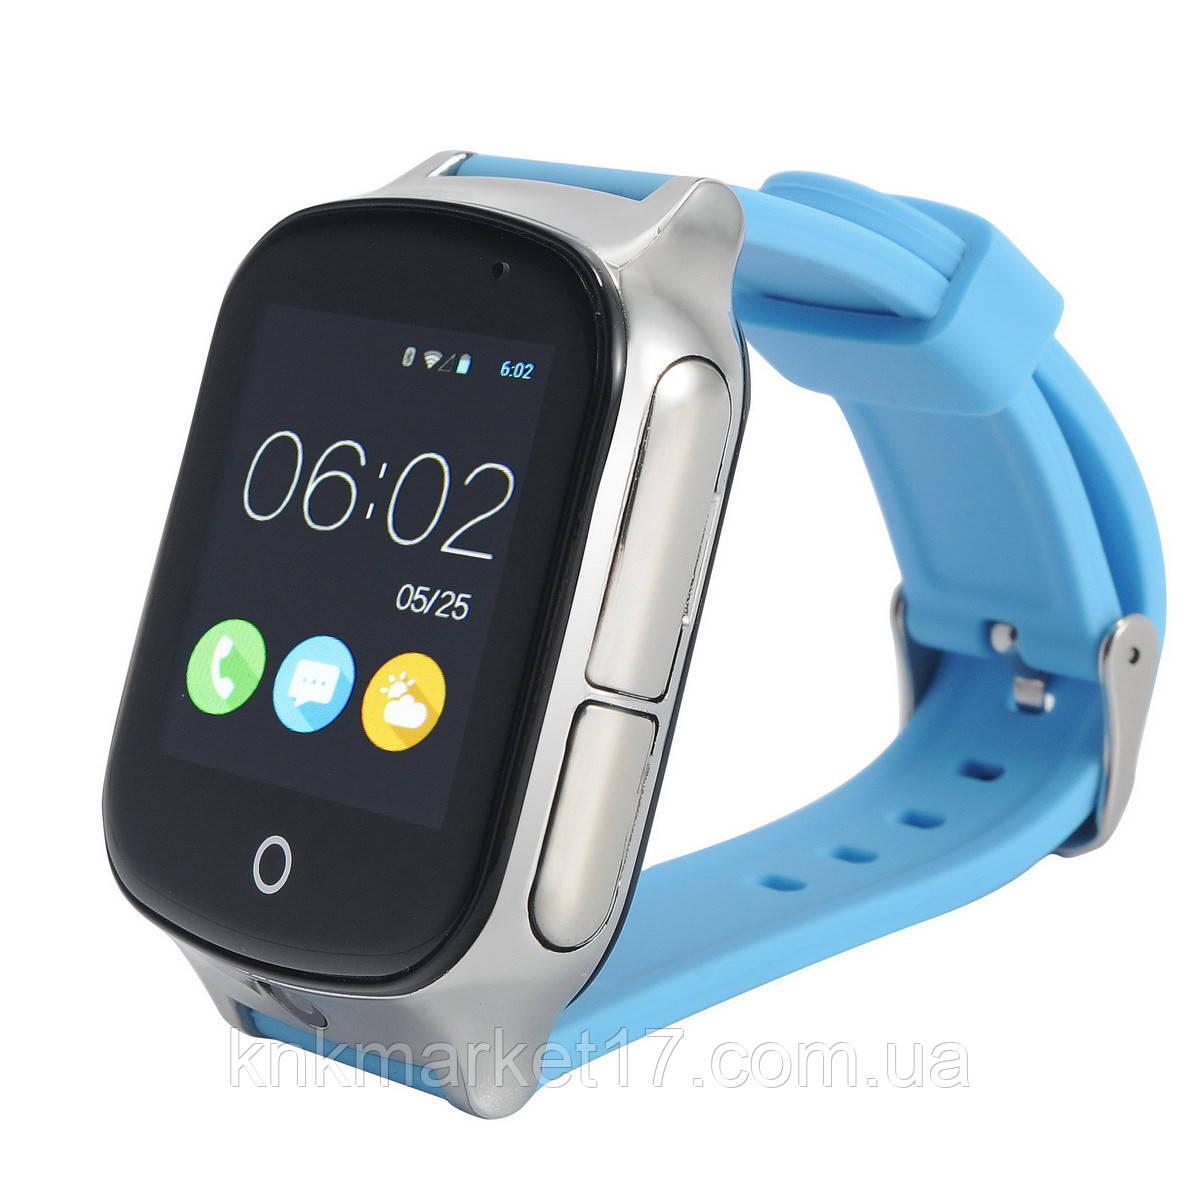 Smart watch A19 blue